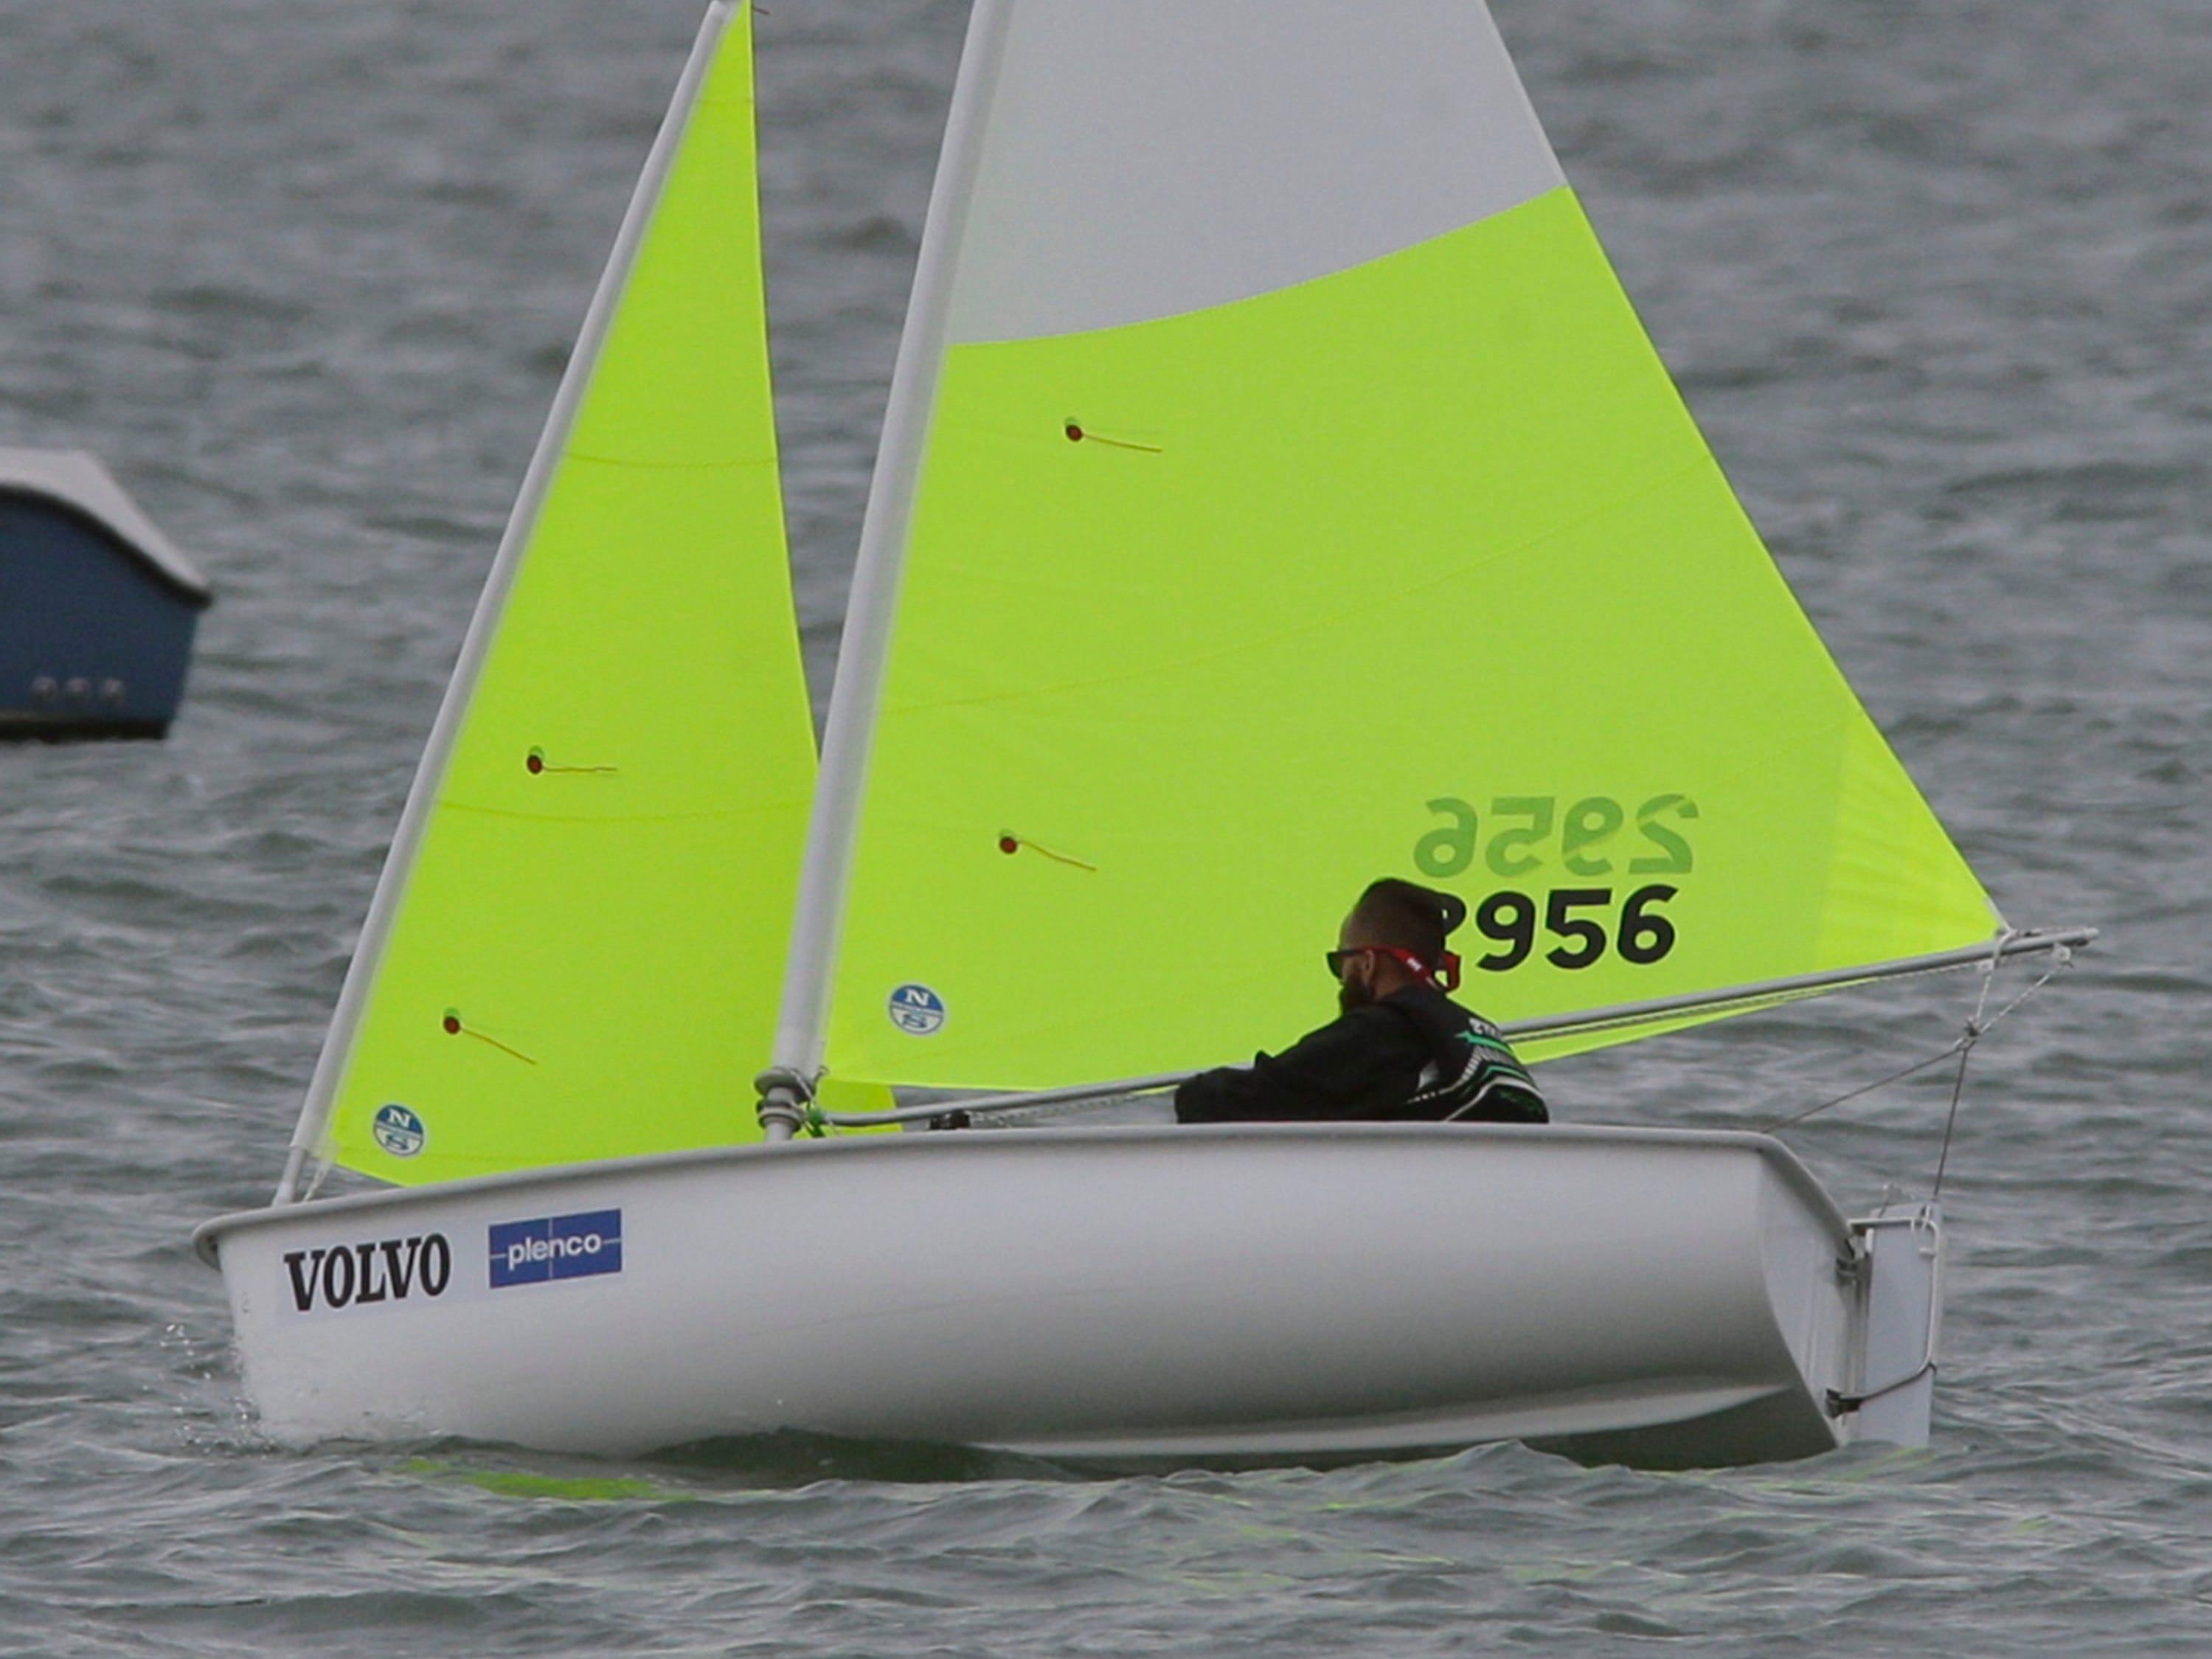 during the Para World Sailing Championships, Tuesday, September 18, 2018, in Sheboygan, Wis.